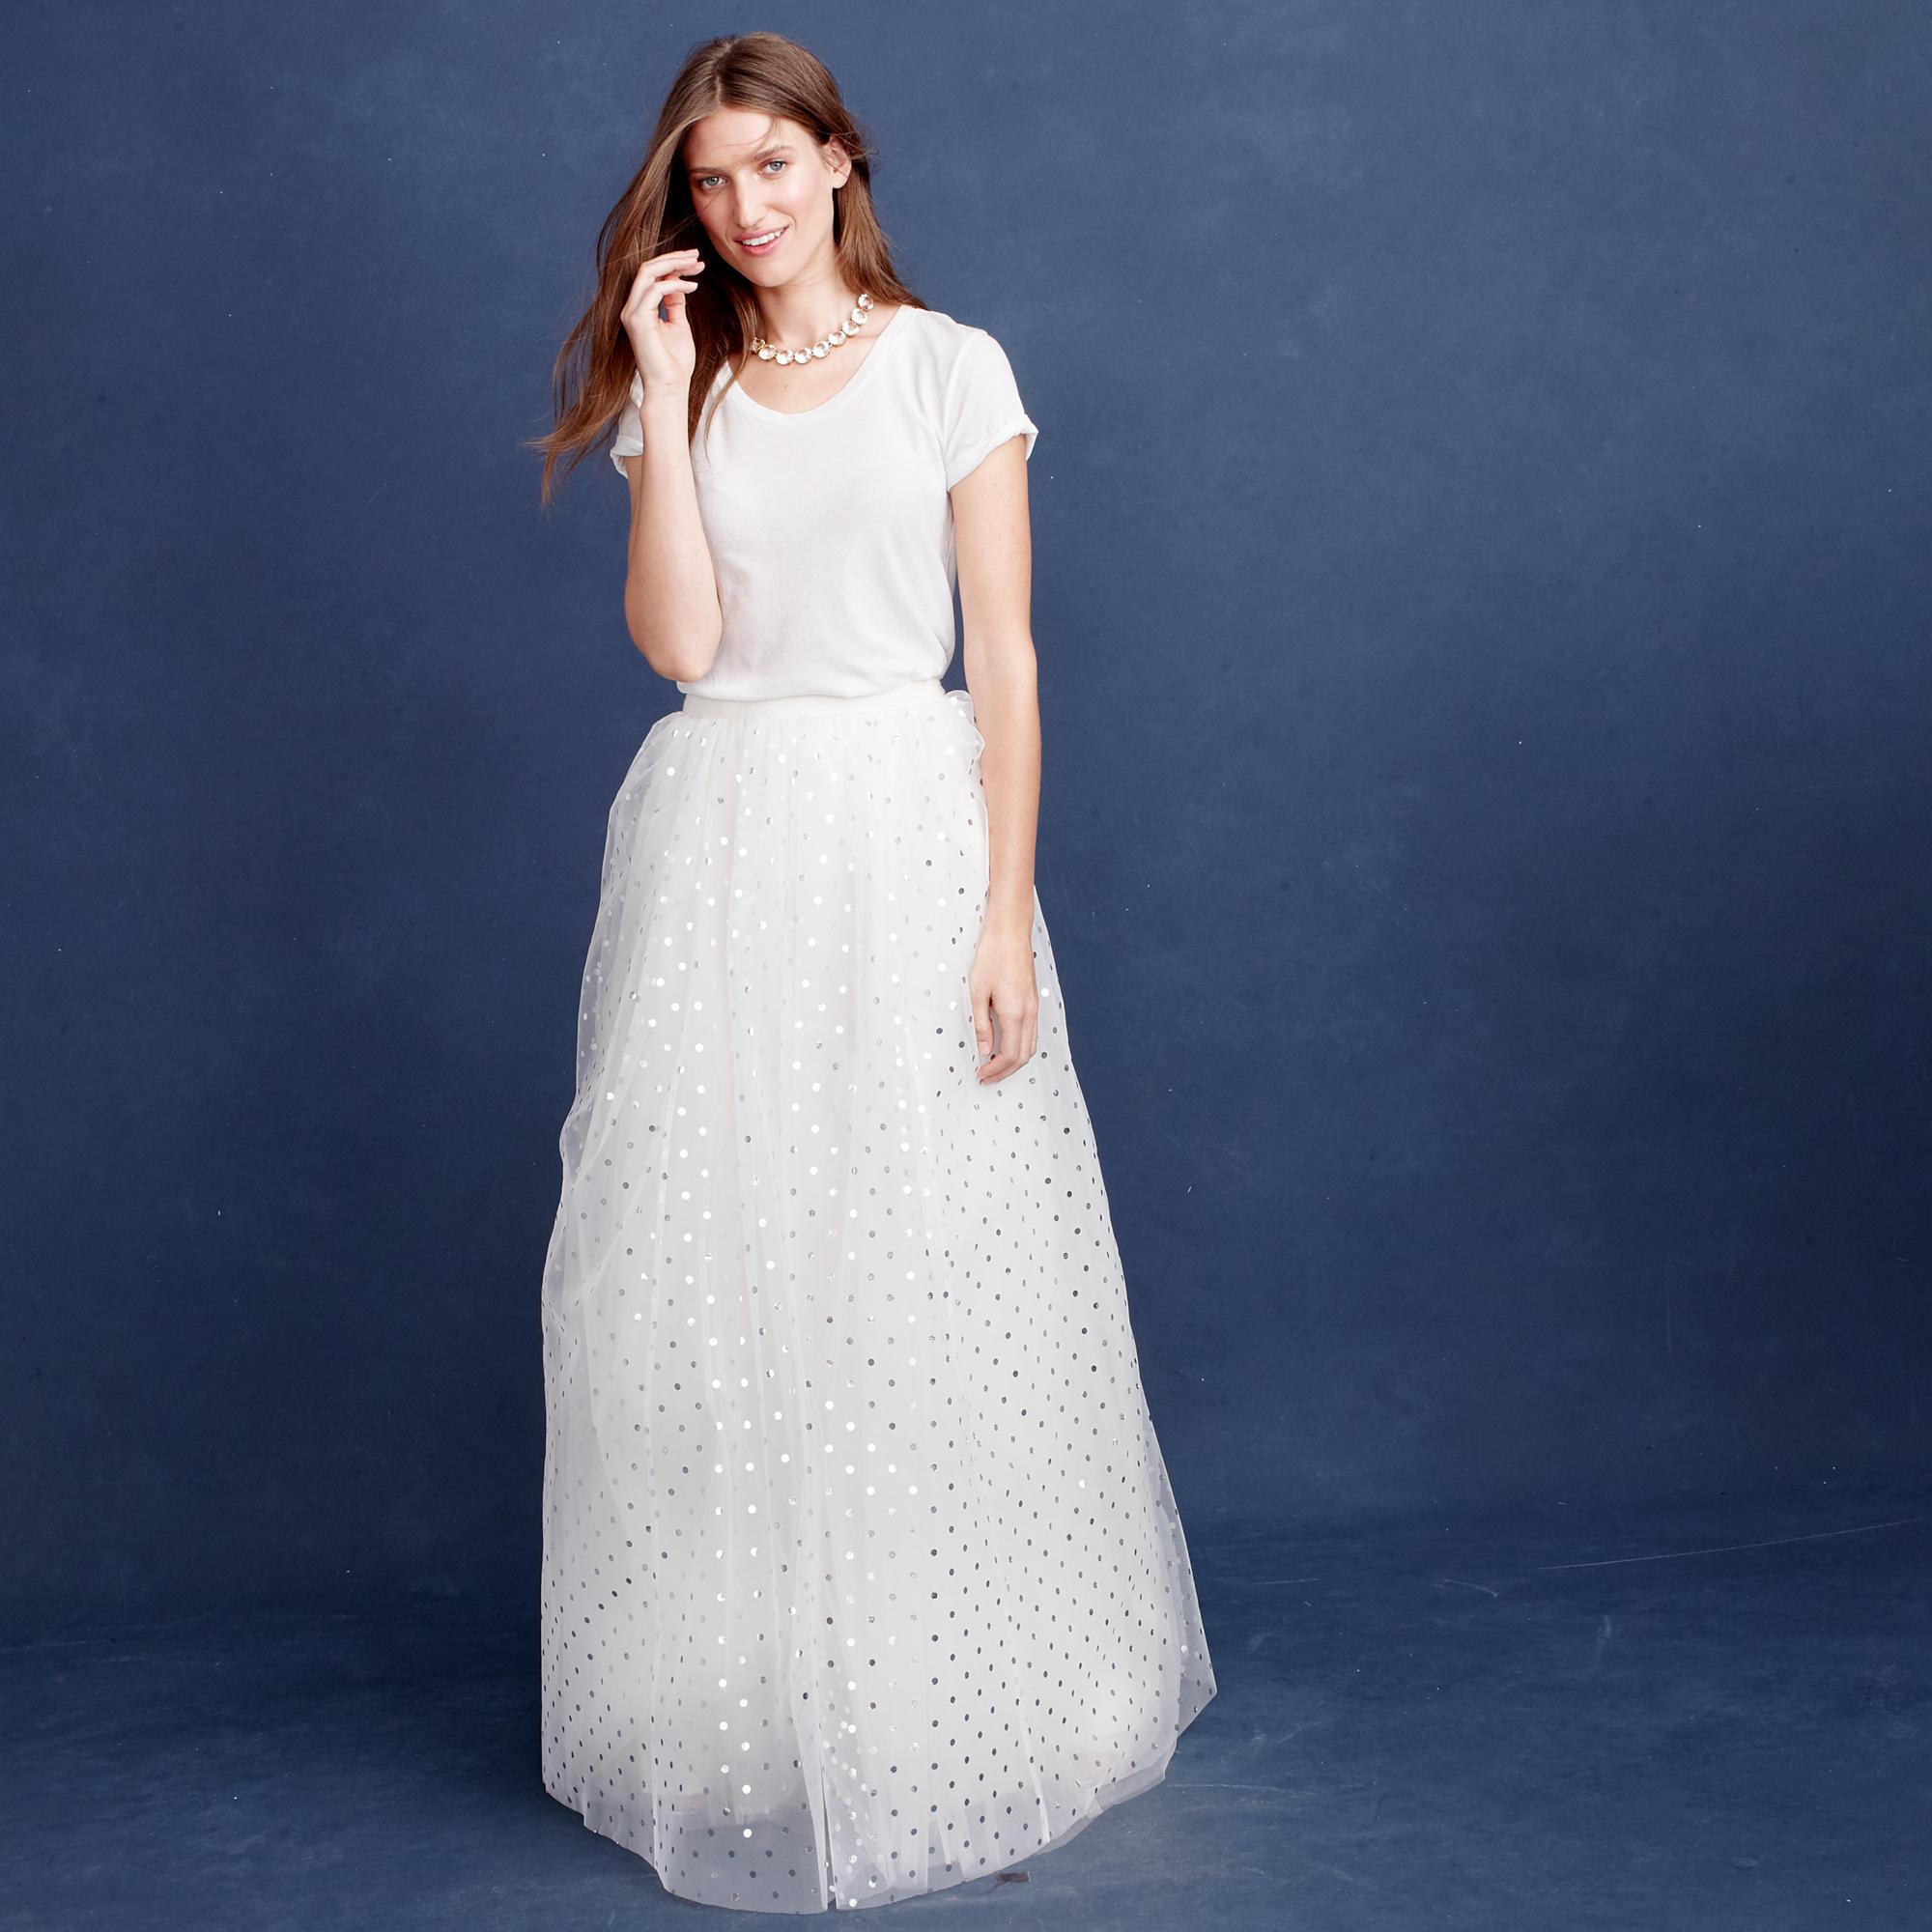 E j crew wedding dress Dalila tulle skirt